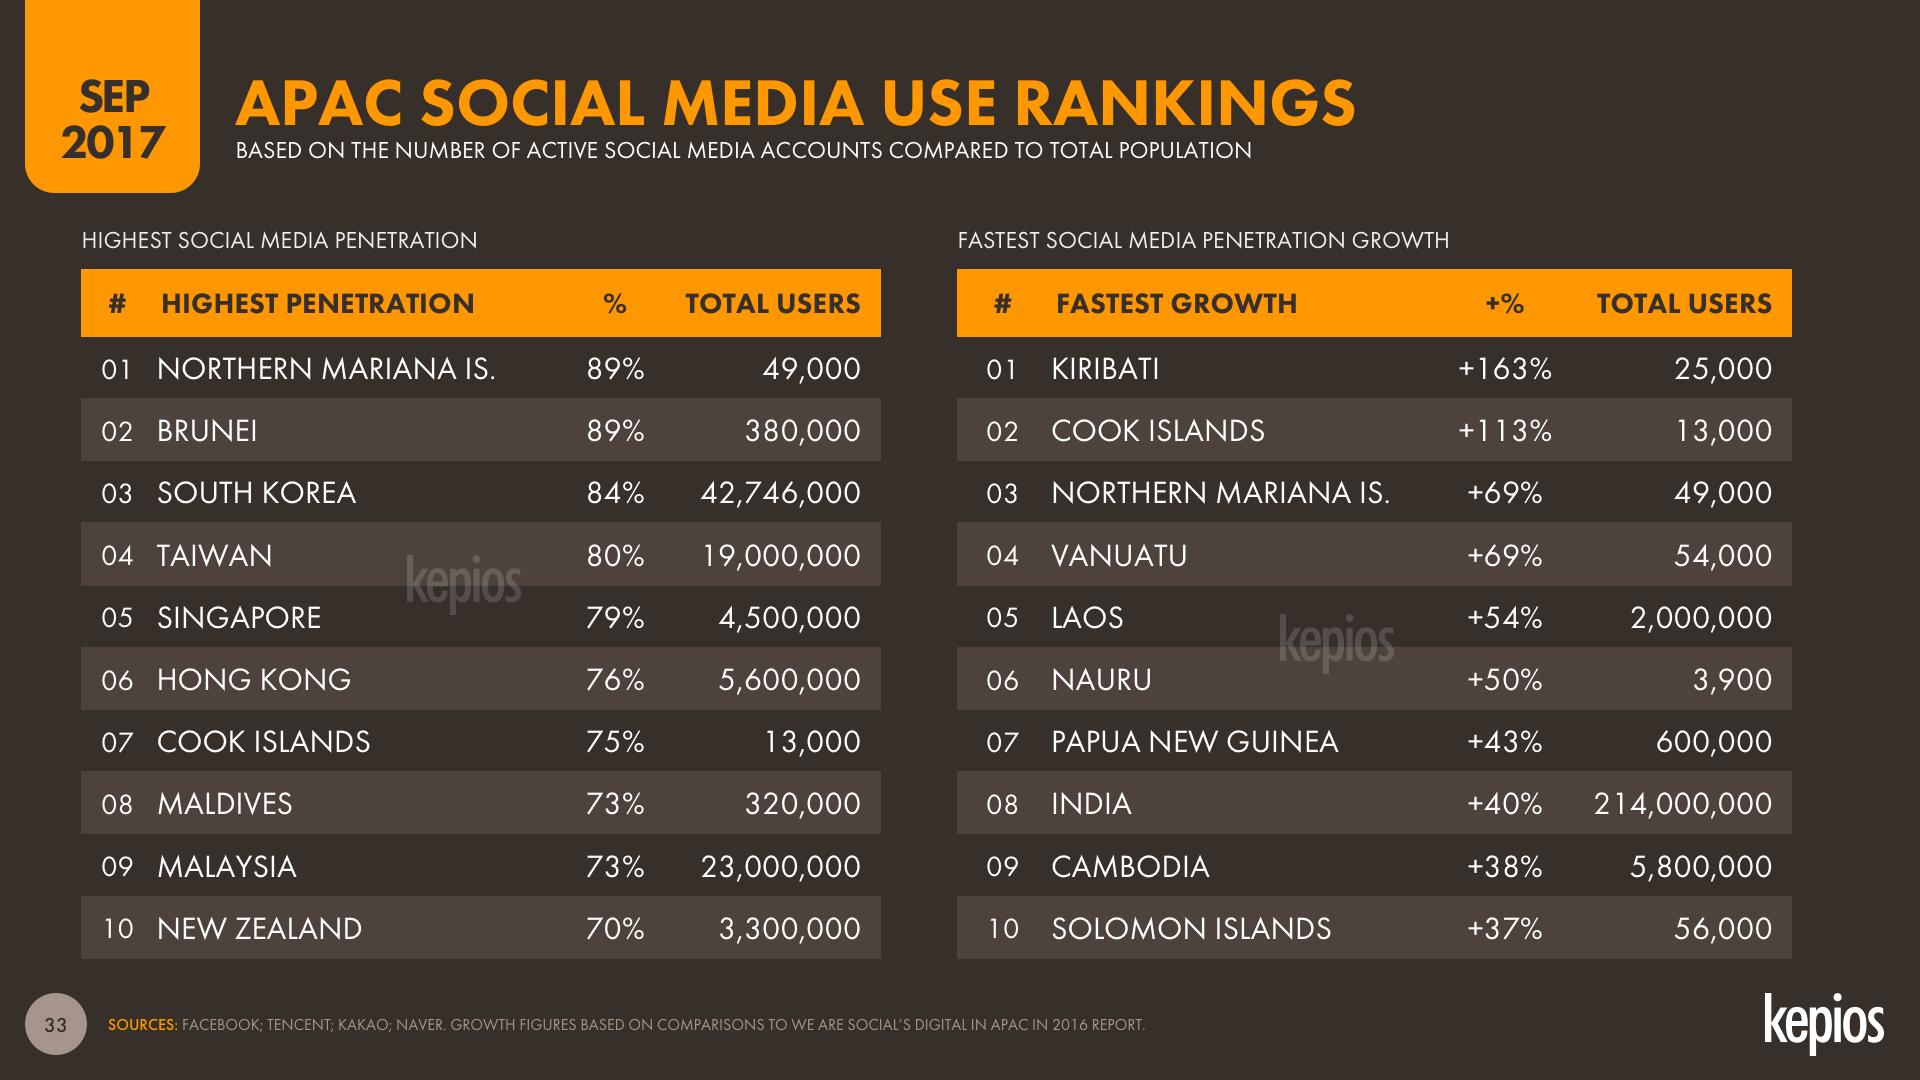 APAC Social Media Penetration Rankings, Sep 2017